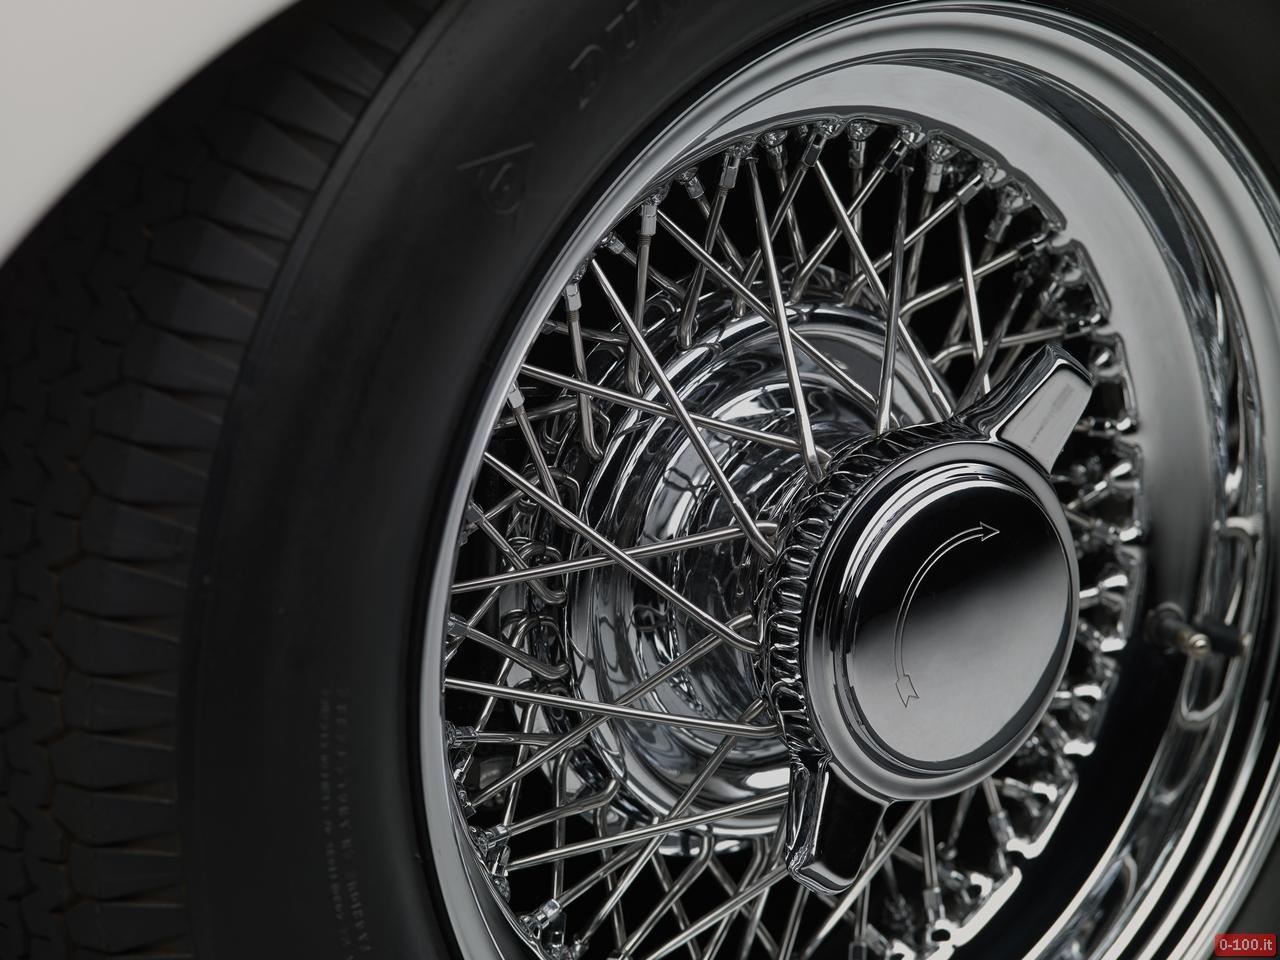 pegaso-z-102-berlinetta-serie-ii-by-carrosserie-j-saoutchik-rm-auctions_0-100_13